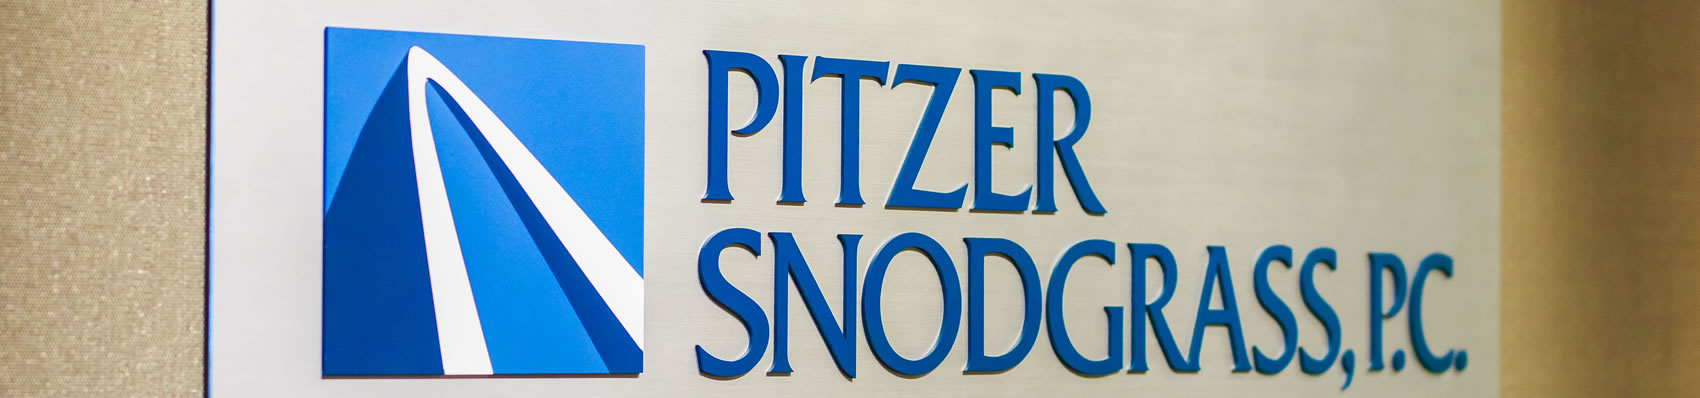 Careers-Pitzer-Snodgrass